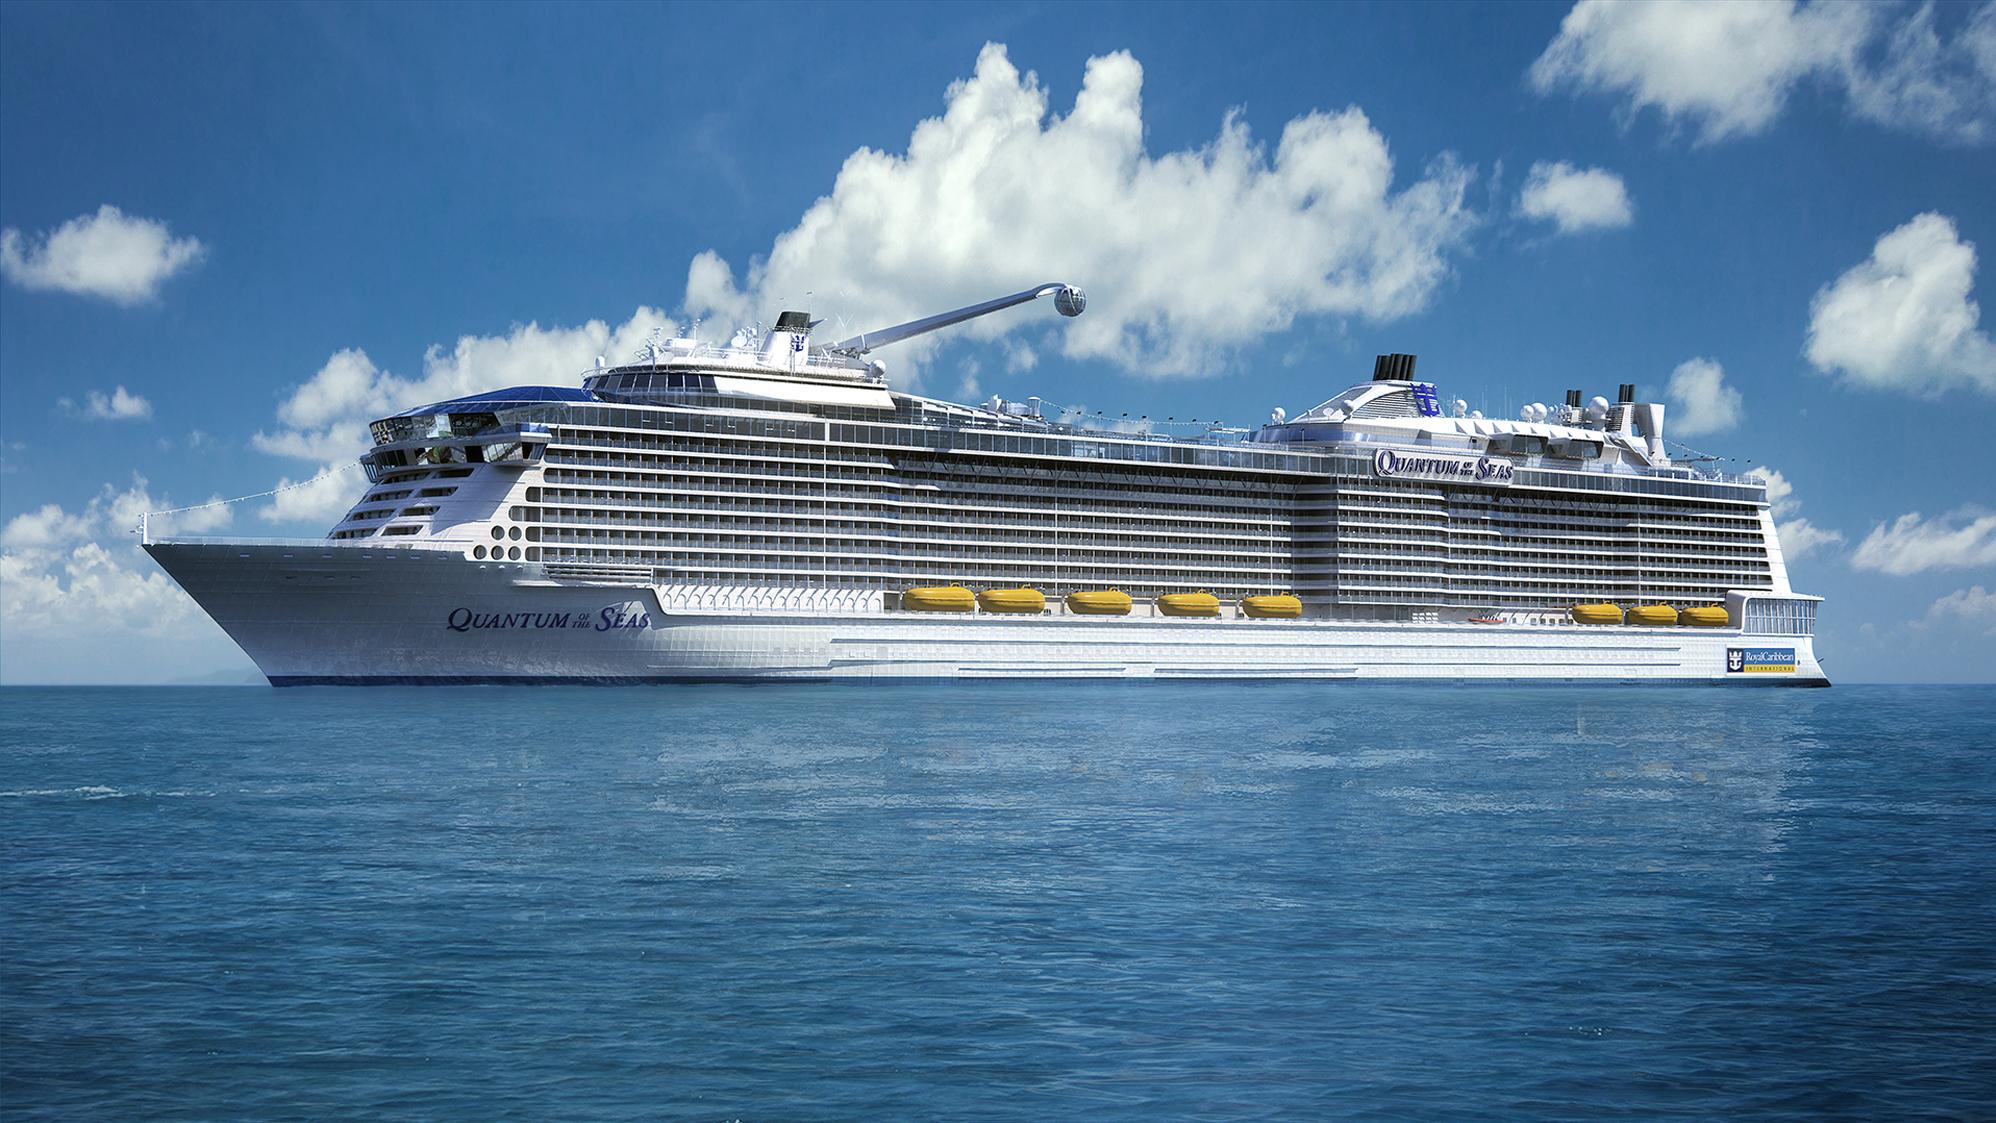 Royal Caribbean Offers 5-Week-Long U.S.-To-China Cruise